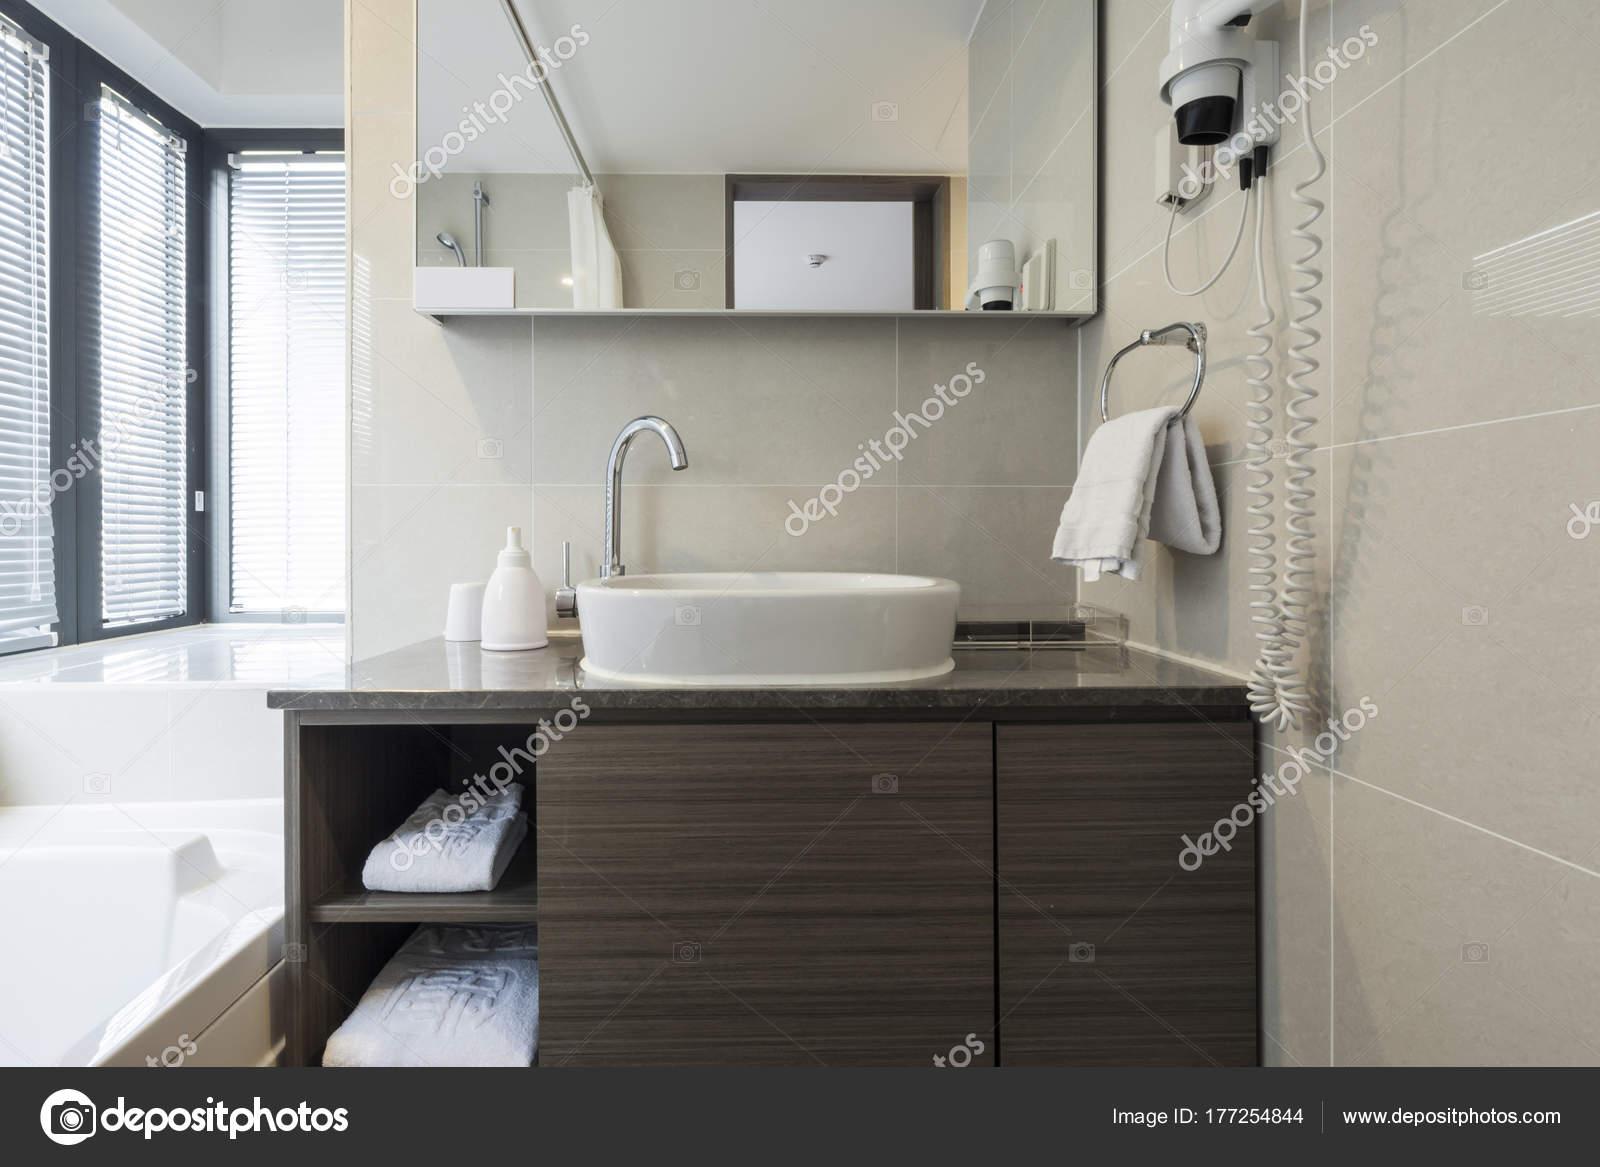 Sauberes Und Modernes Hotel Badezimmer — Stockfoto © earlyspring ...